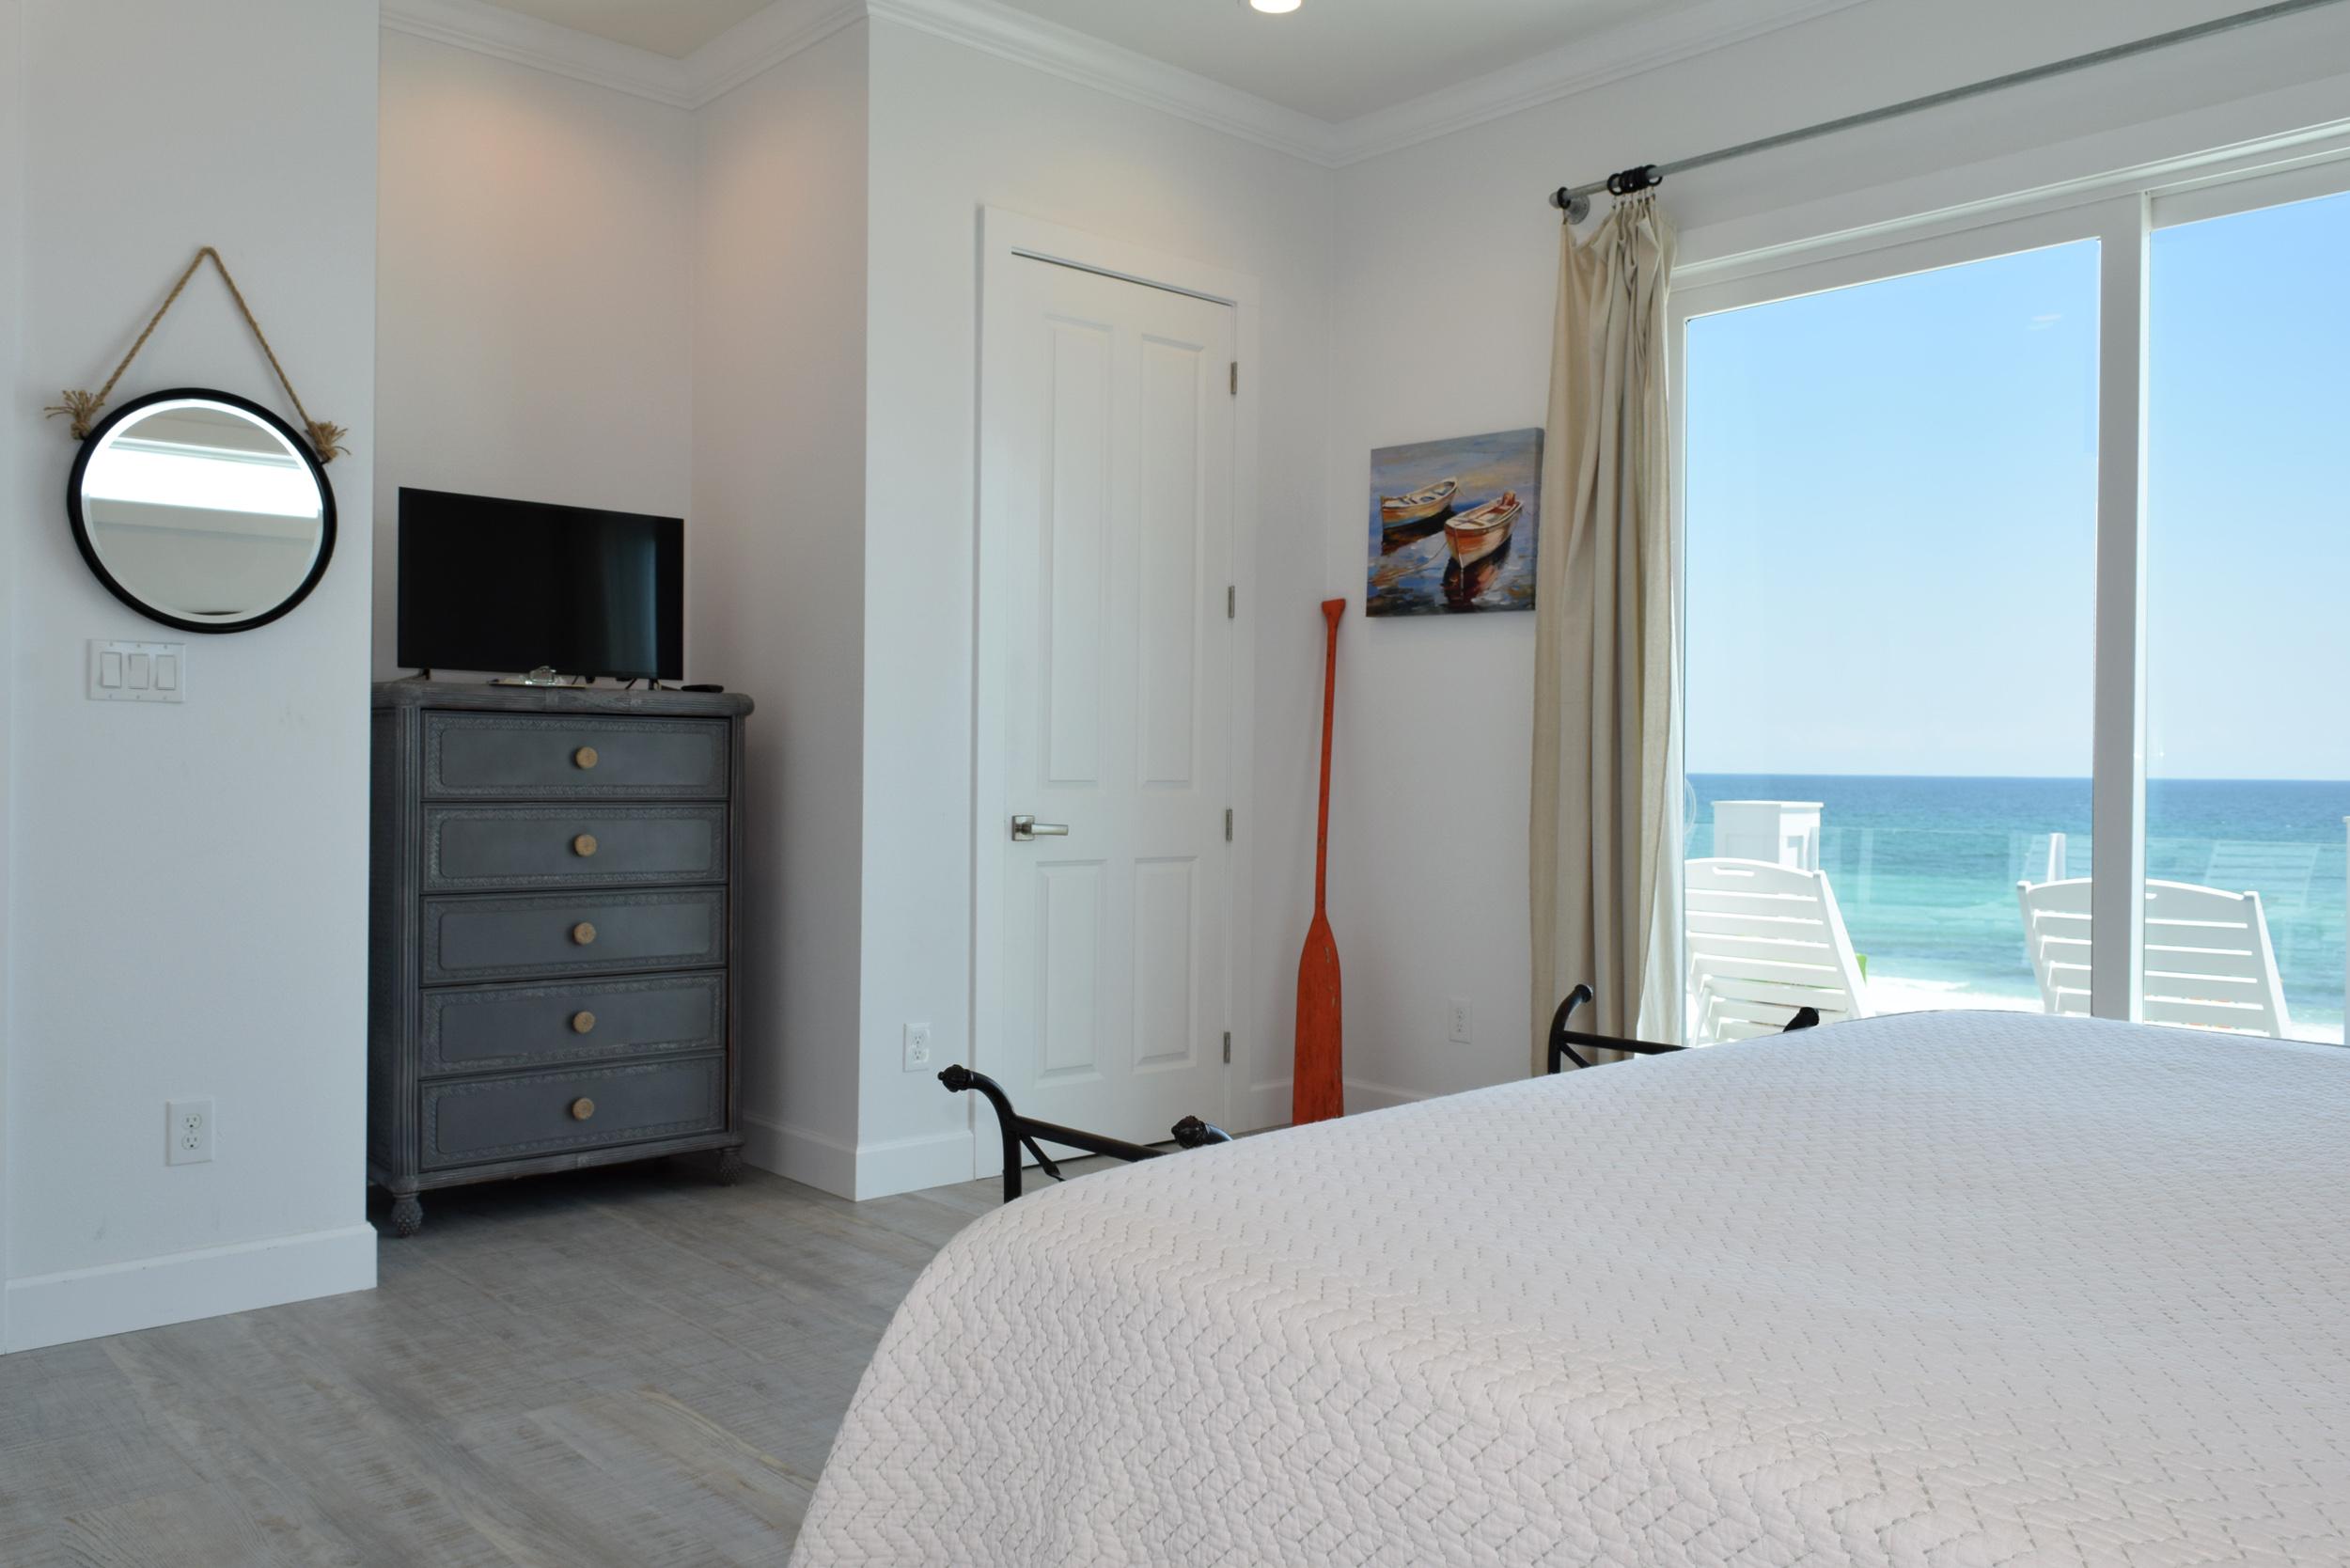 Ariola 1008 House/Cottage rental in Pensacola Beach House Rentals in Pensacola Beach Florida - #31